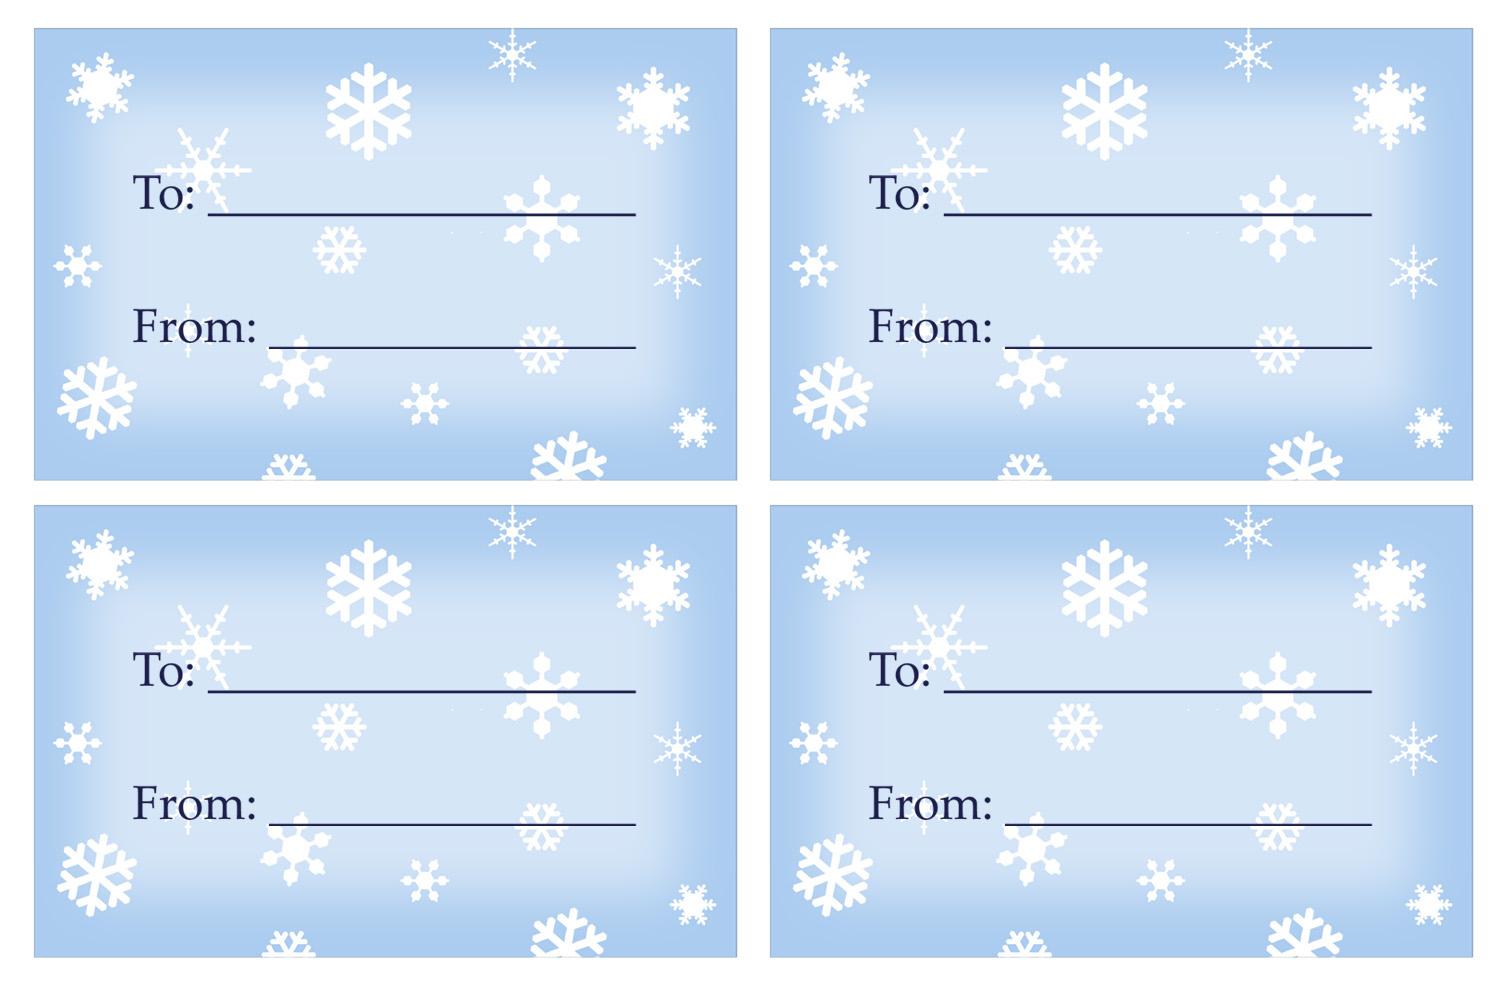 40 Unique Printable Christmas Gift Tags | Kittybabylove - Free Printable Gift Tags Templates